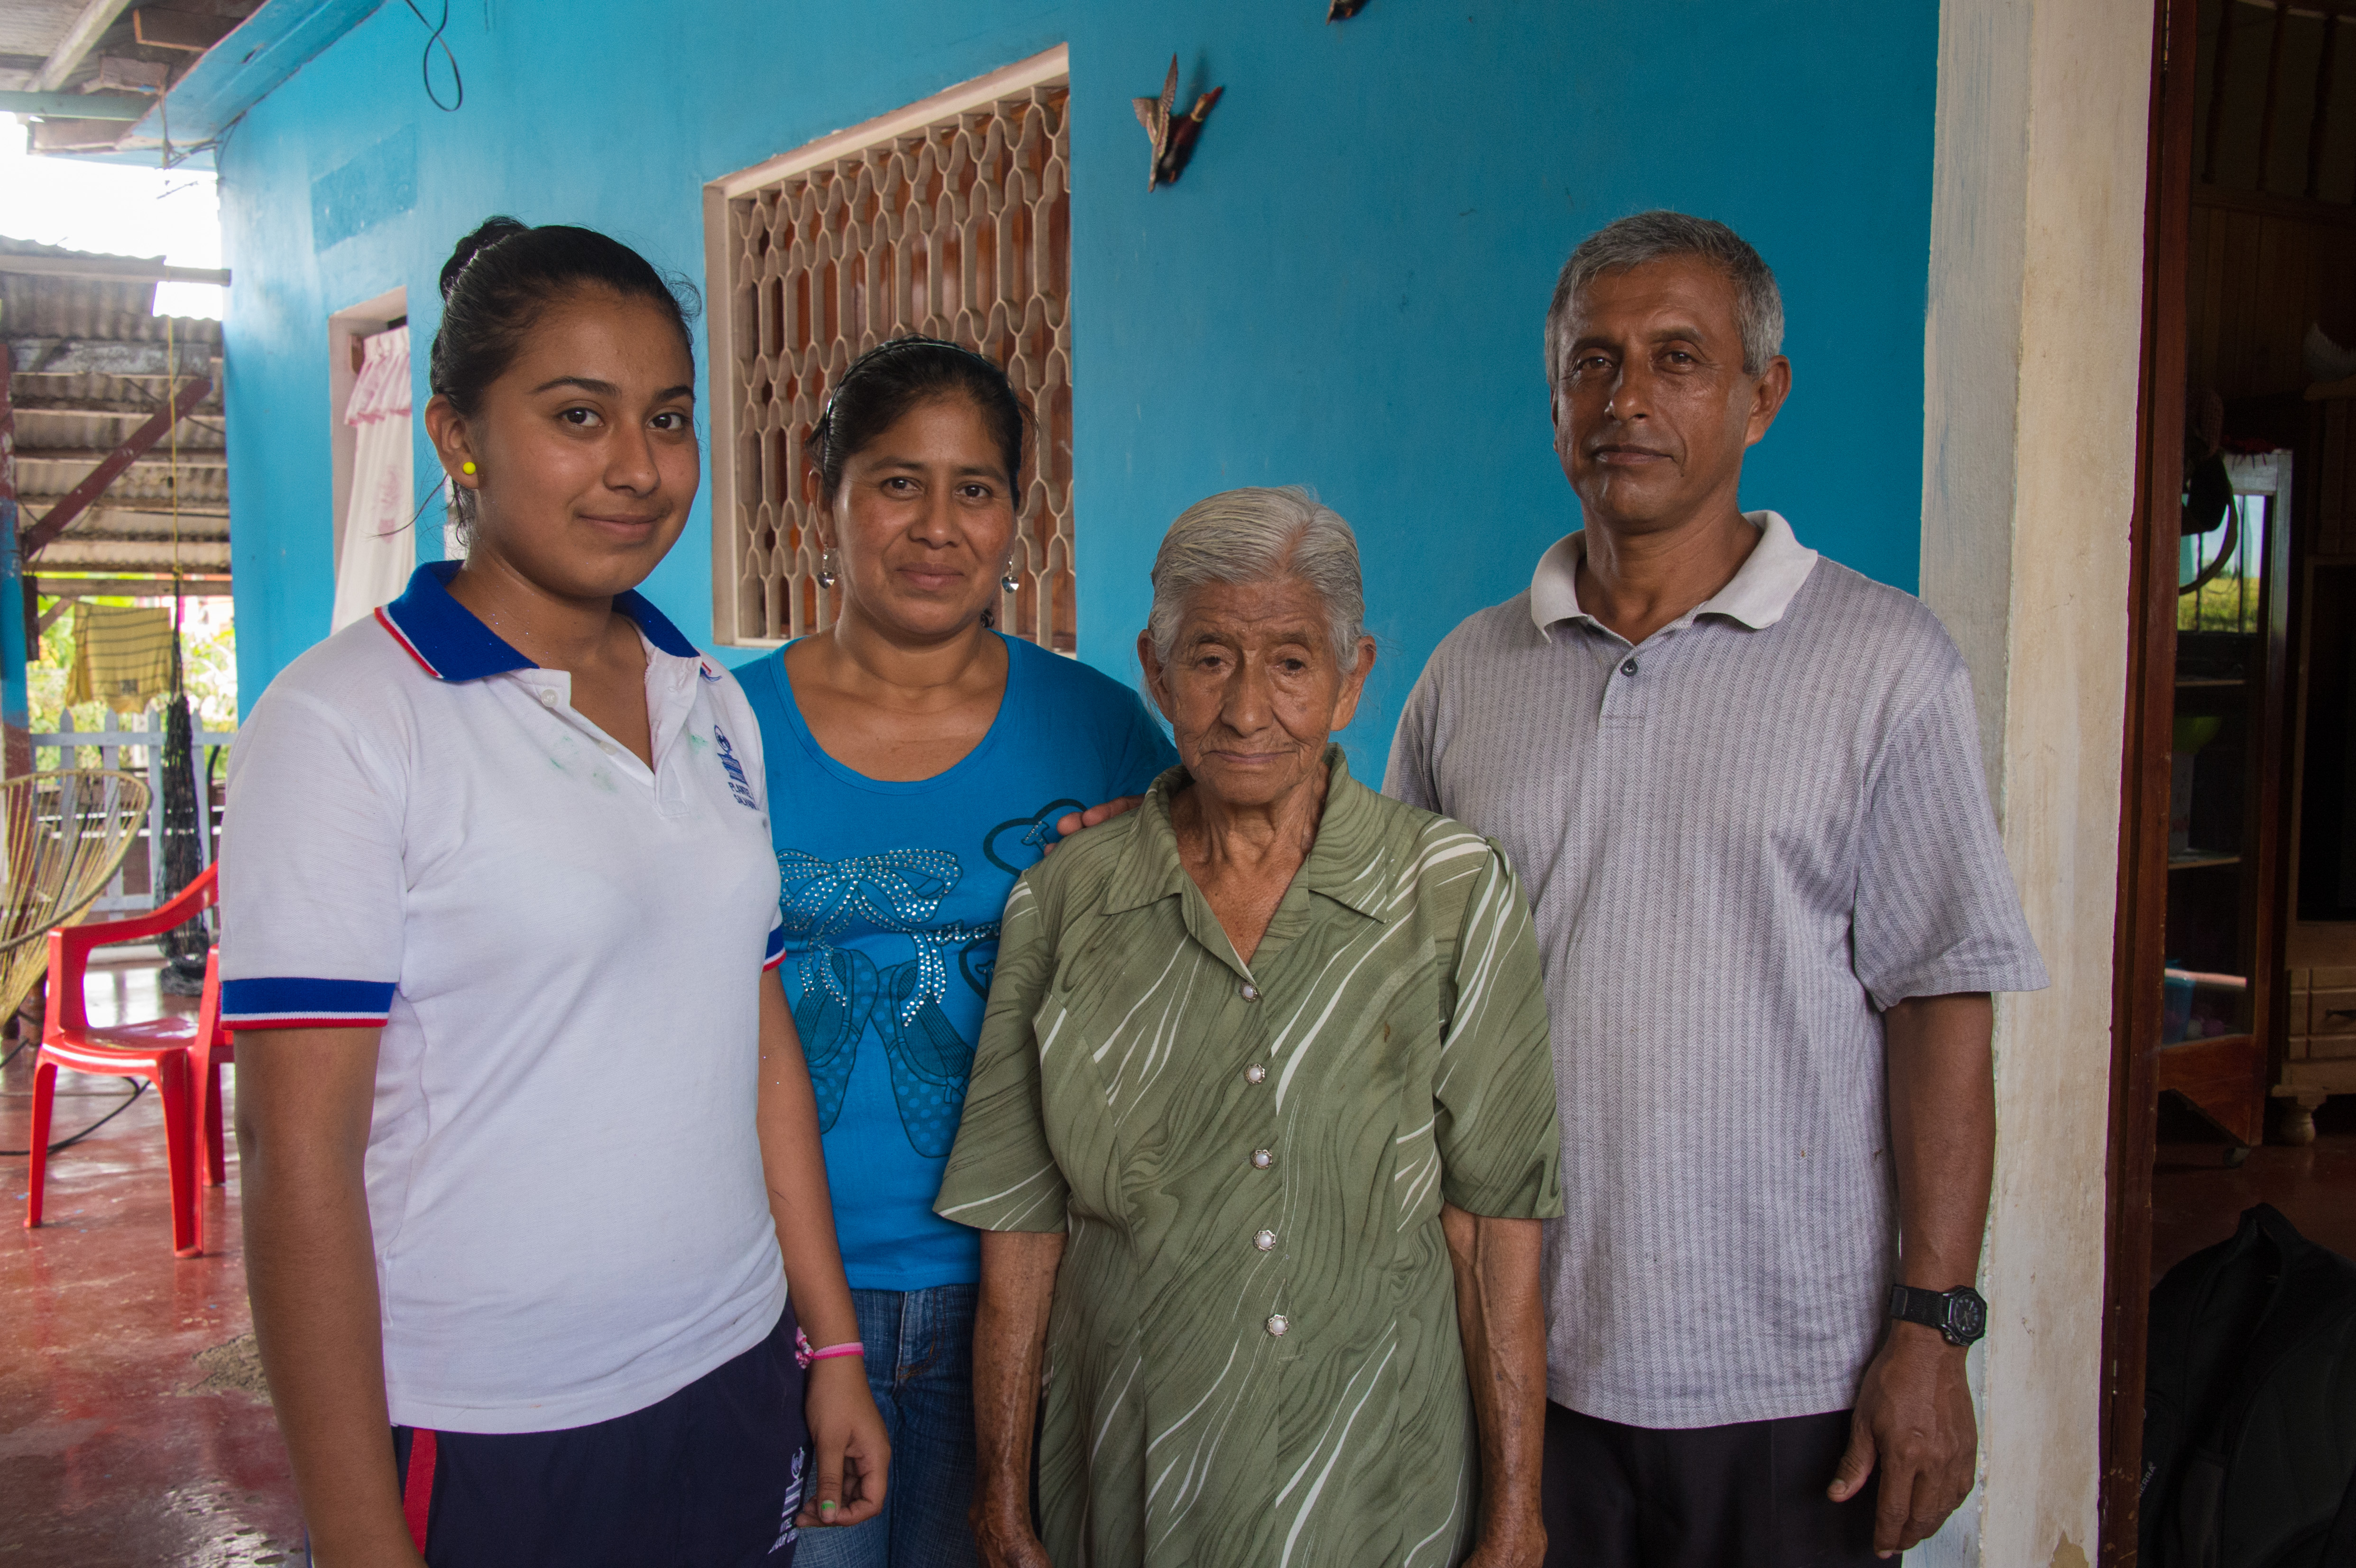 Founding member Soraida Santiago with her son Mundo, daughter-in-law Ydelda and granddaughter Nilda.